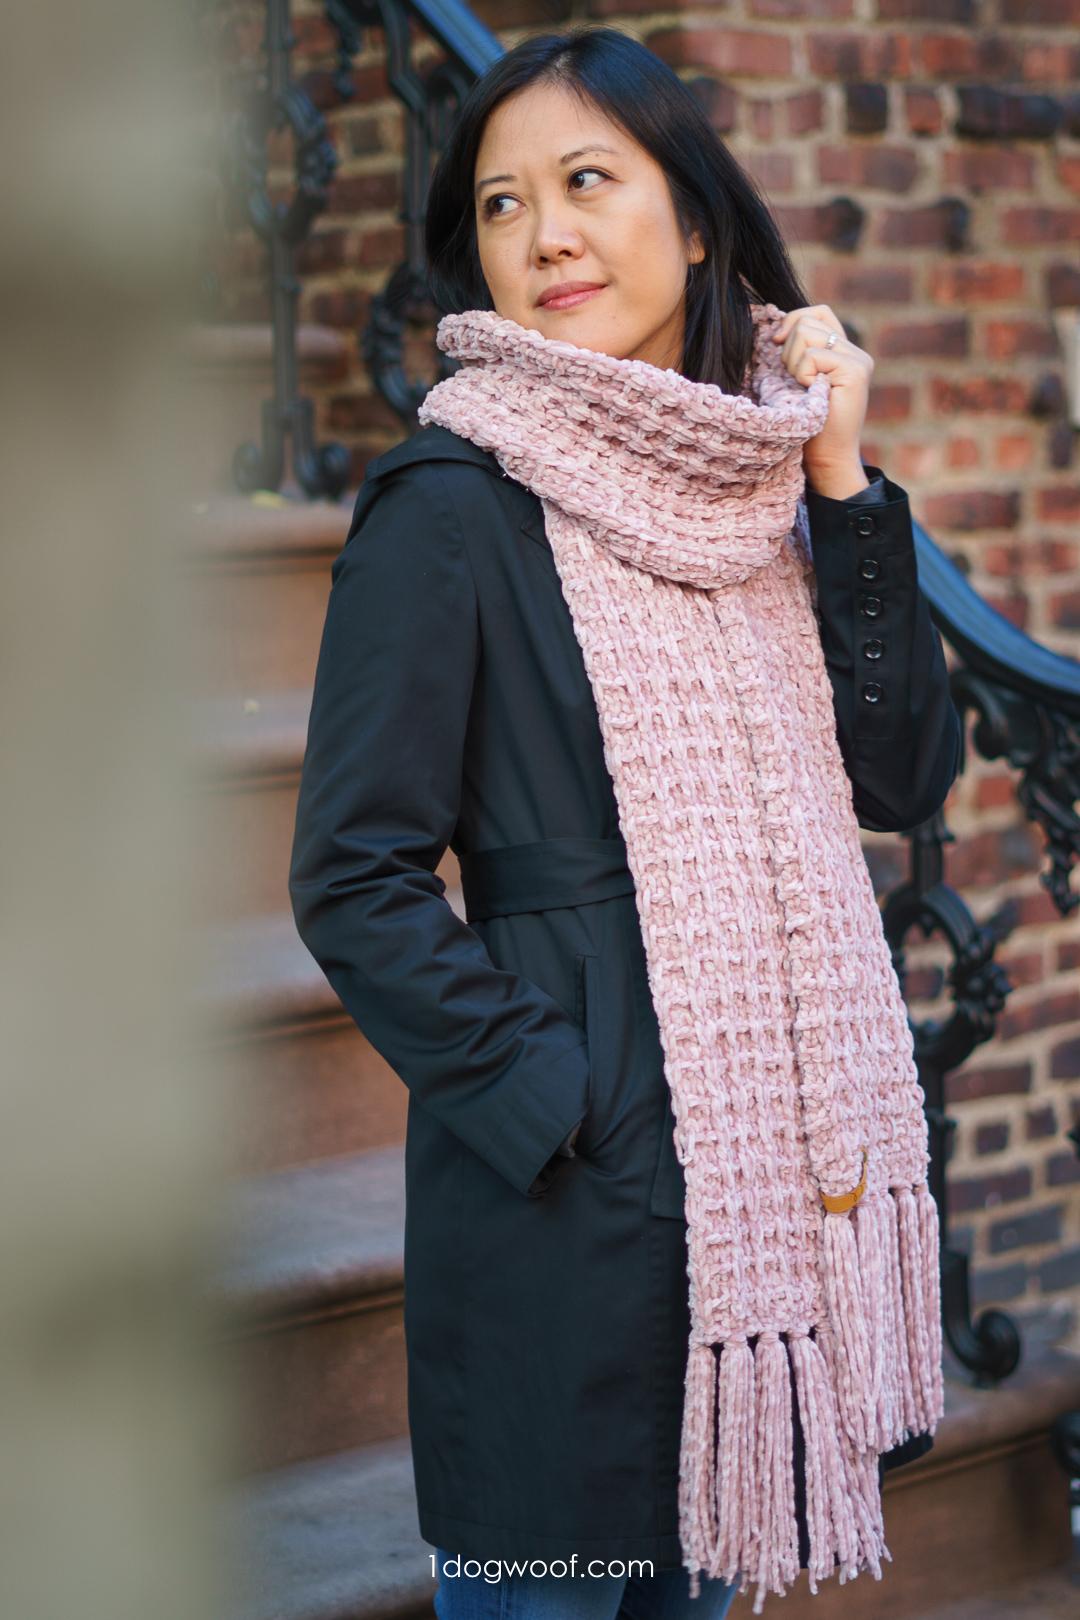 Snowbird Waffle-Knit Scarf: Free Knitting Pattern